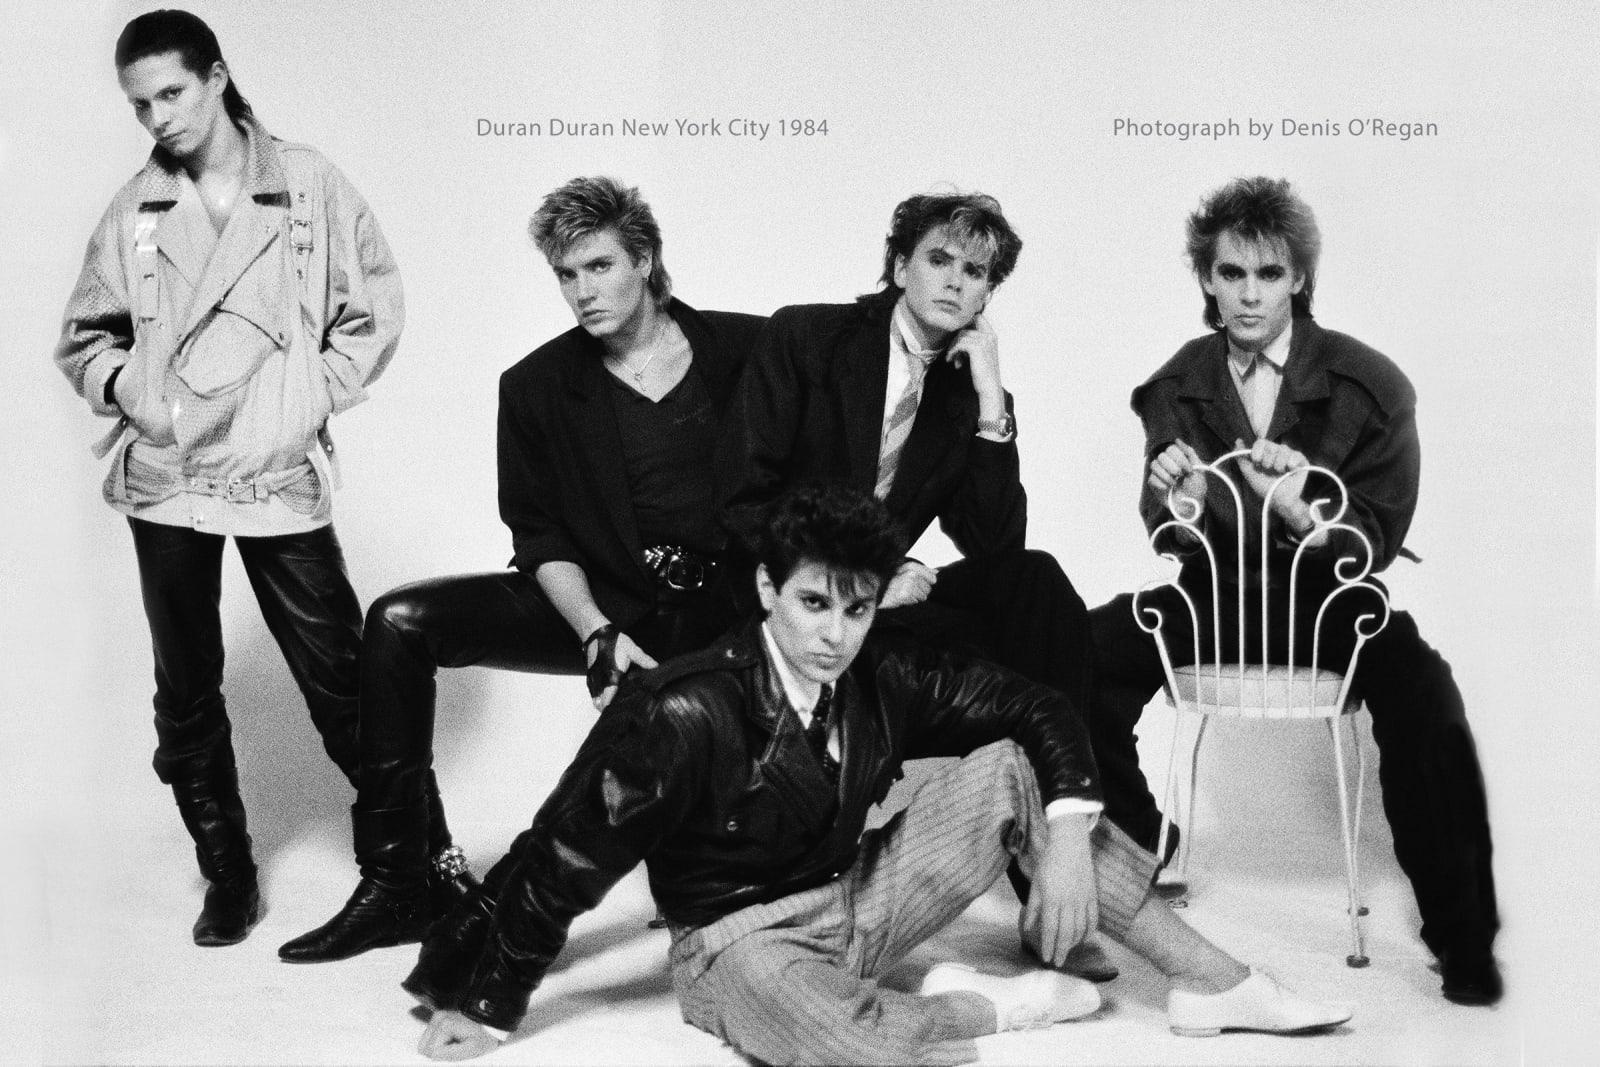 DURAN DURAN, Duran Duran New York, 1984